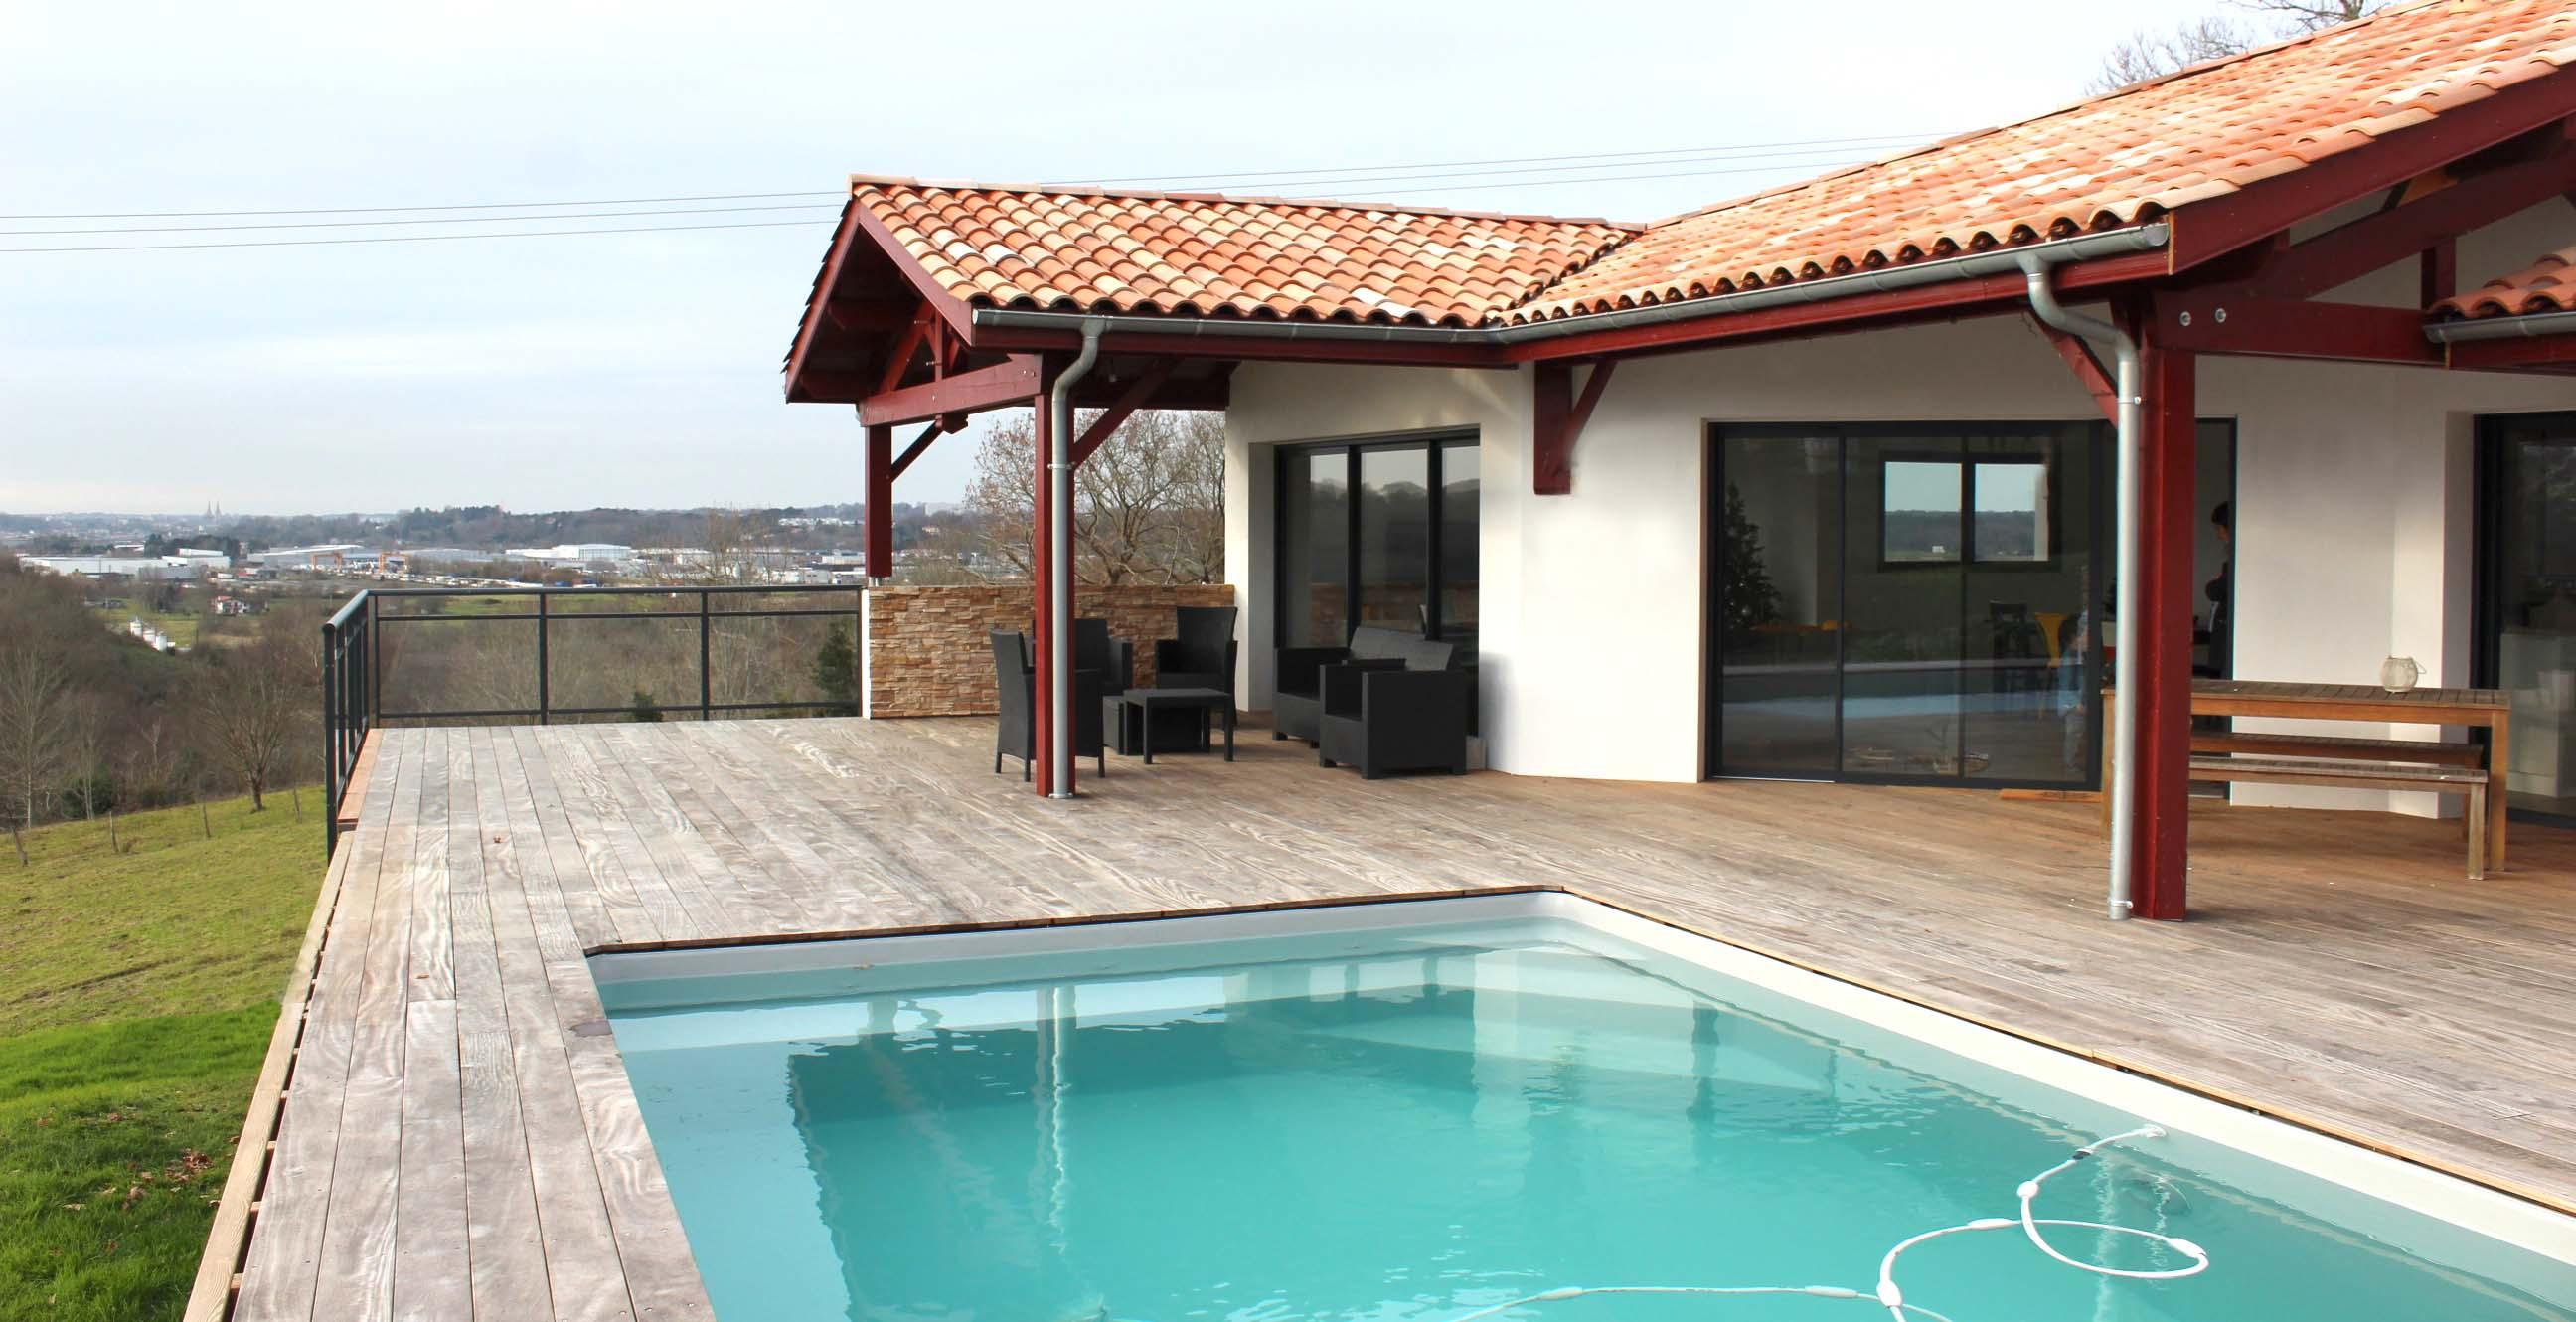 constructeur maison basque avie home. Black Bedroom Furniture Sets. Home Design Ideas